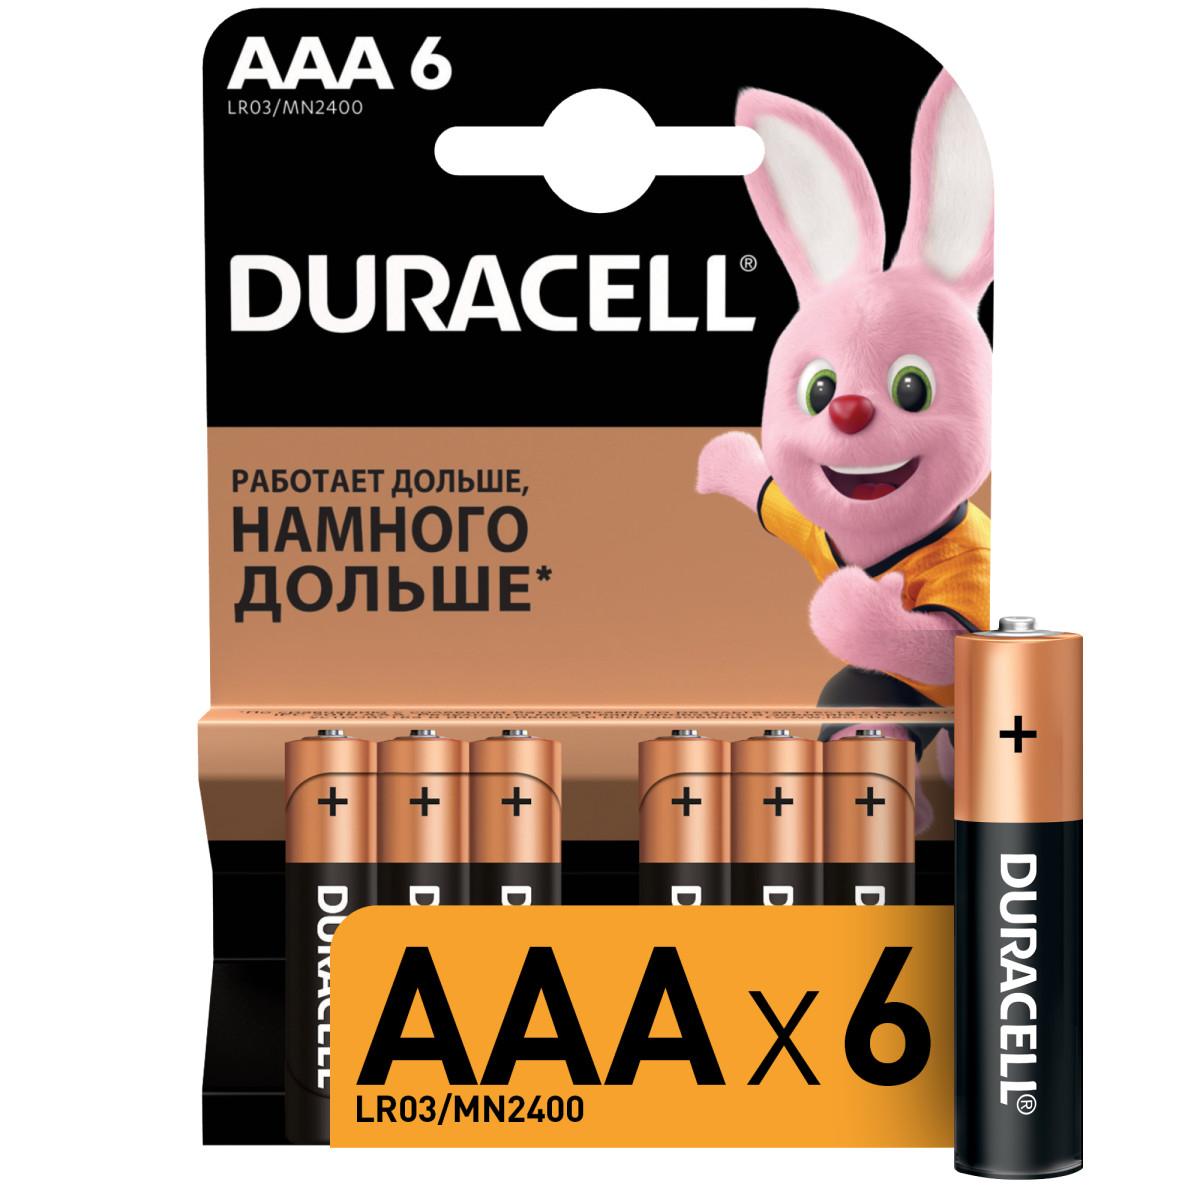 Батарейка алкалиновая Duracell AAA/LR03 6 шт